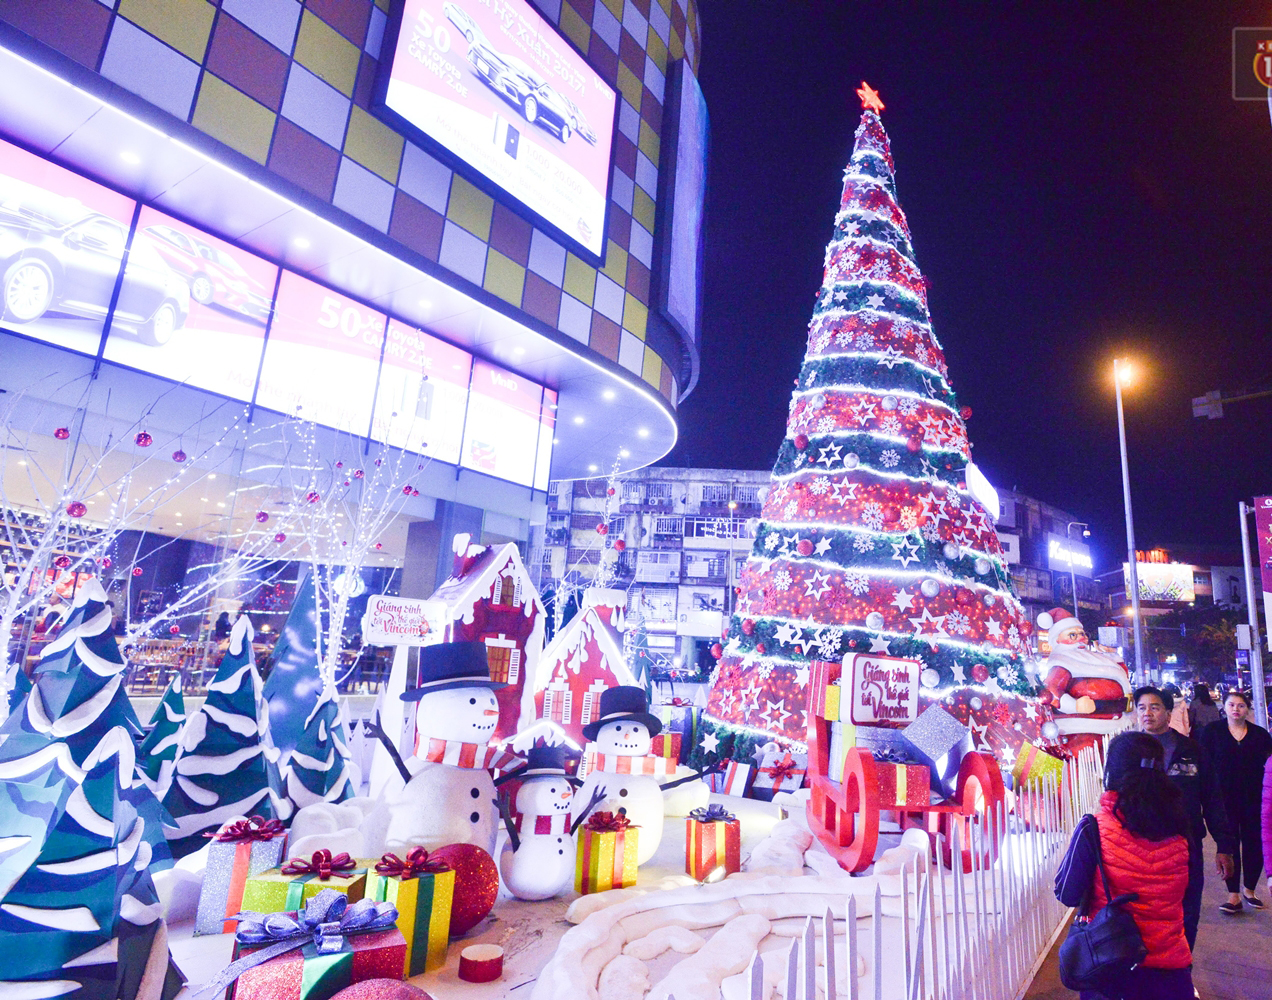 Dự báo thời tiết, Thời tiết Noel, Thời tiết Giáng sinh, Thời tiết noel 2018, thời tiết giáng sinh 2018, thời tiết hà nội, thời tiết miền bắc, thời tiết hôm nay, noel